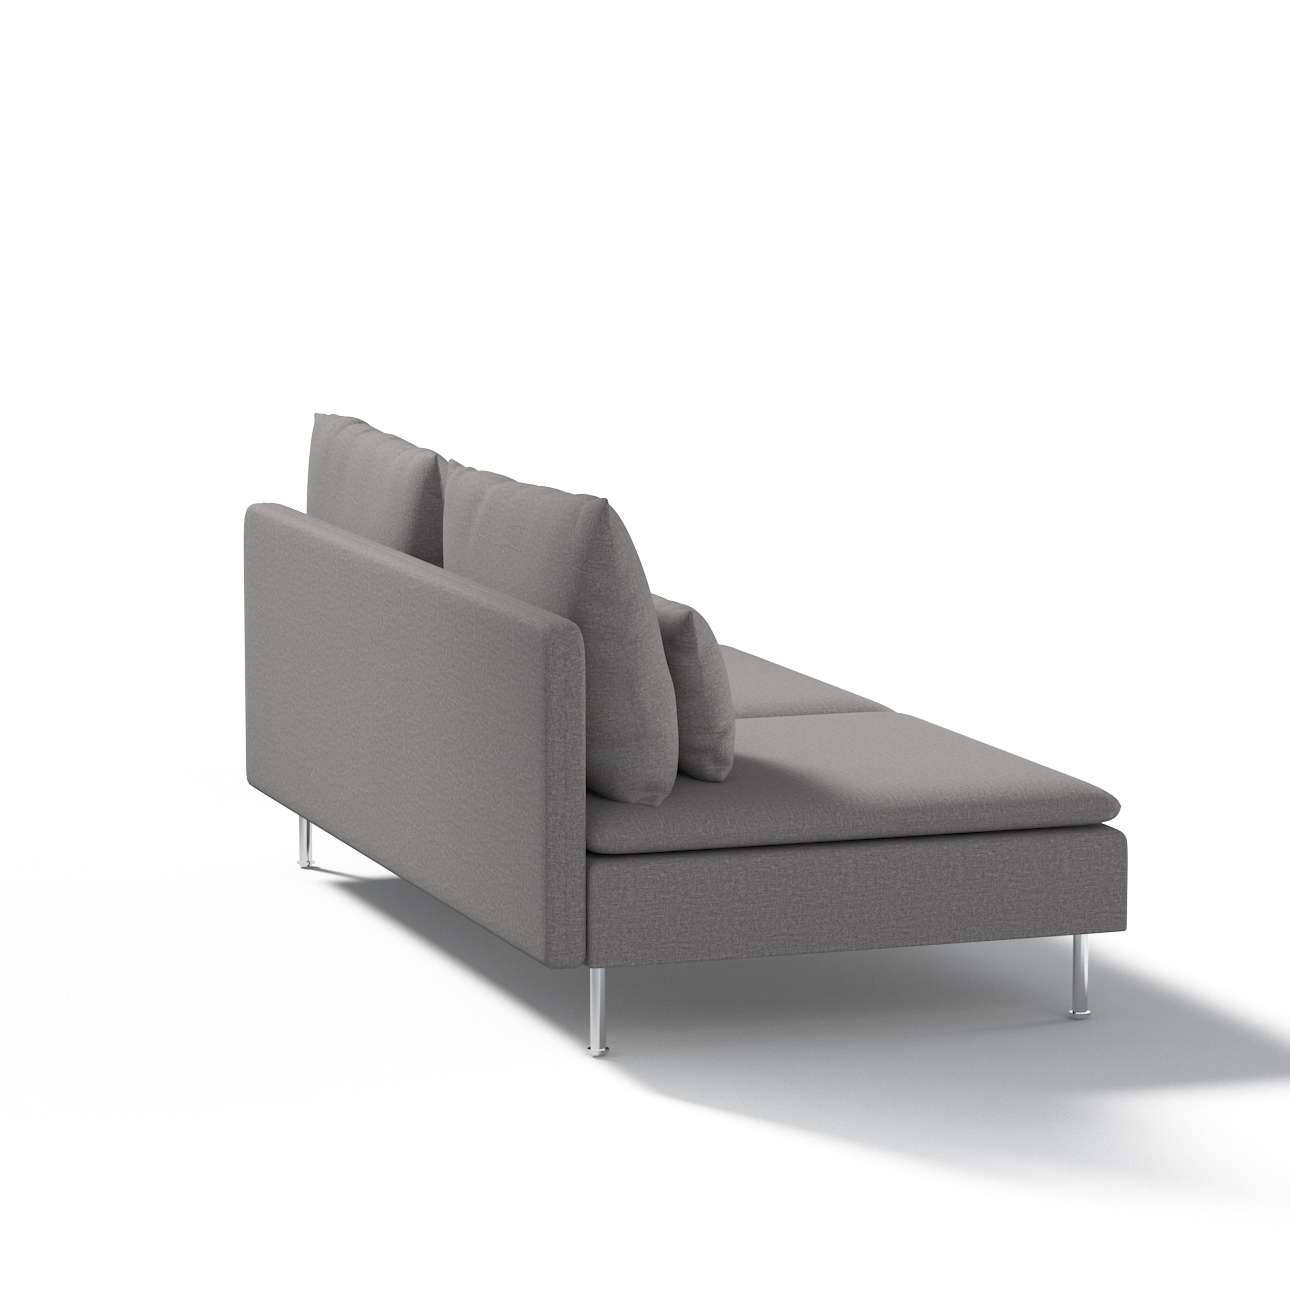 s derhamn bezug f r sitzelement 3 grau dekoria. Black Bedroom Furniture Sets. Home Design Ideas